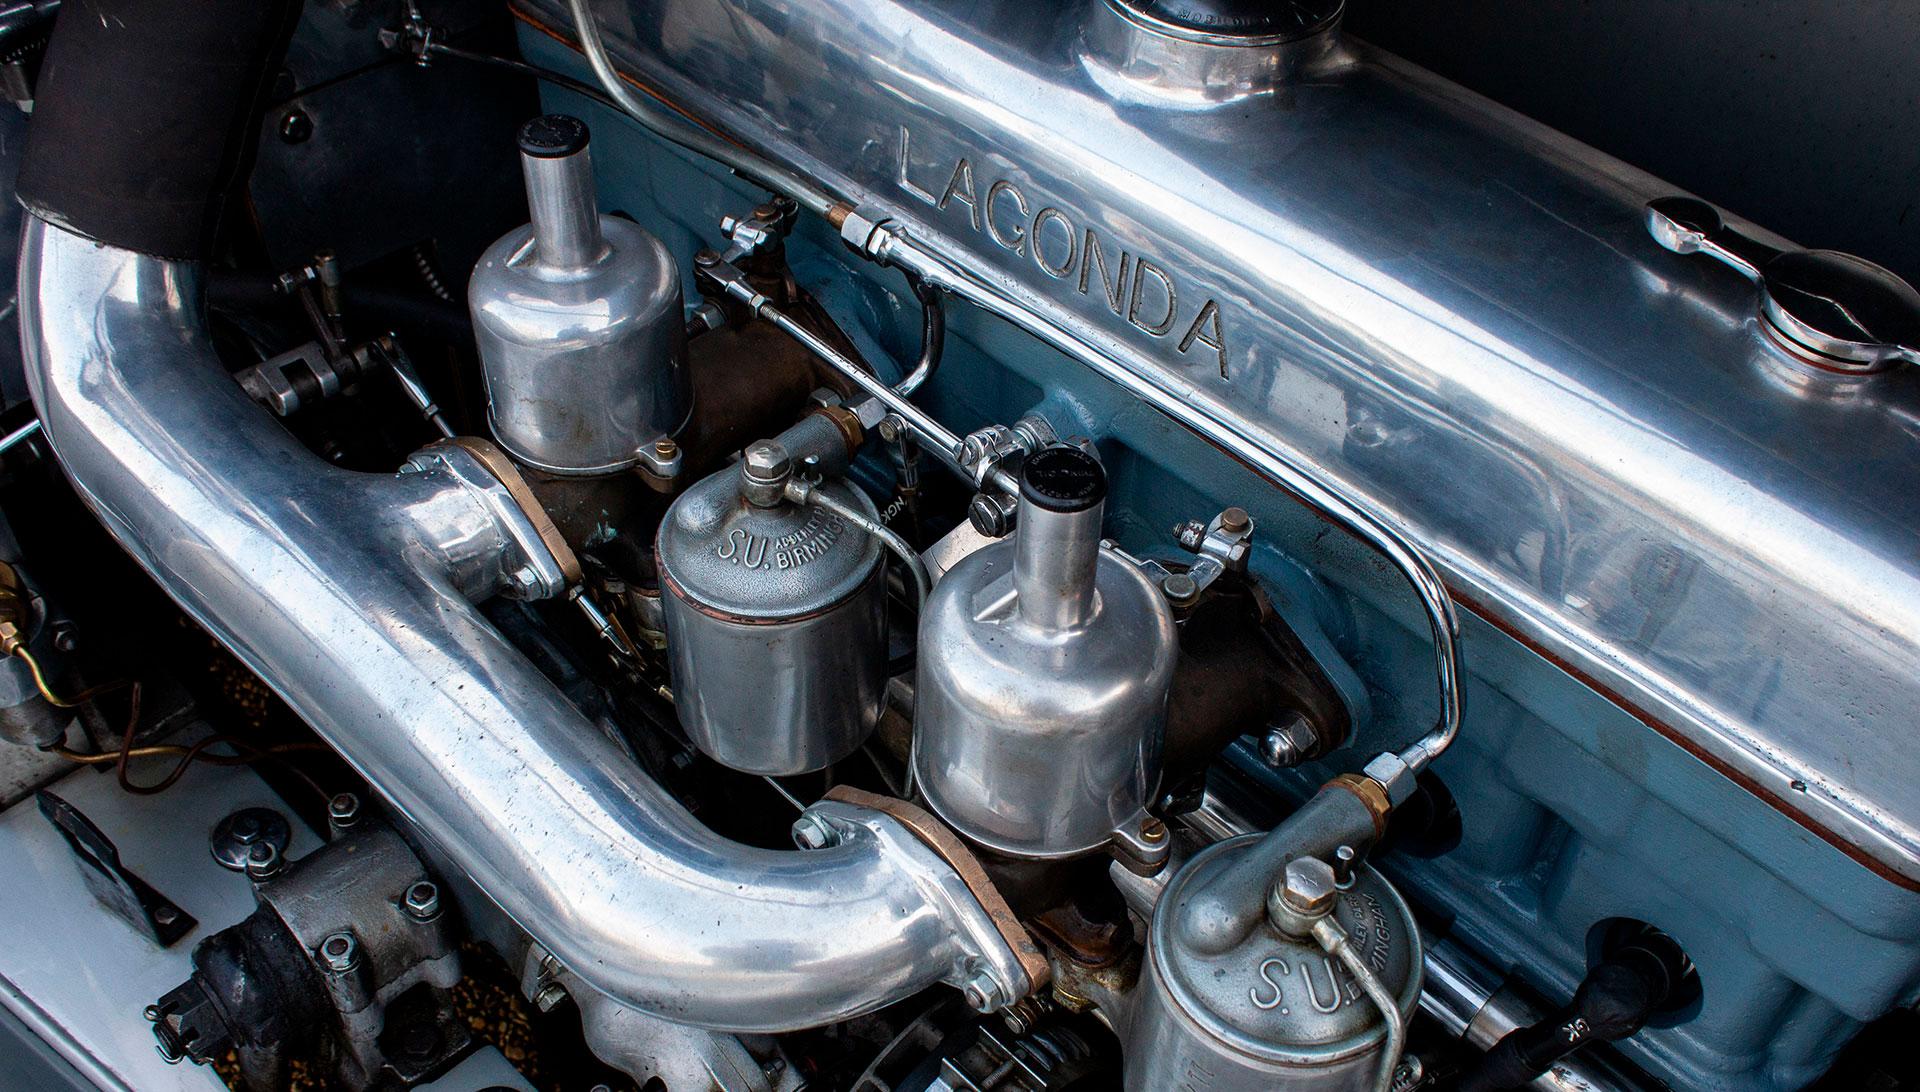 1937 Lagonda LG45 Tourer for sale at The Classic Motor Hub